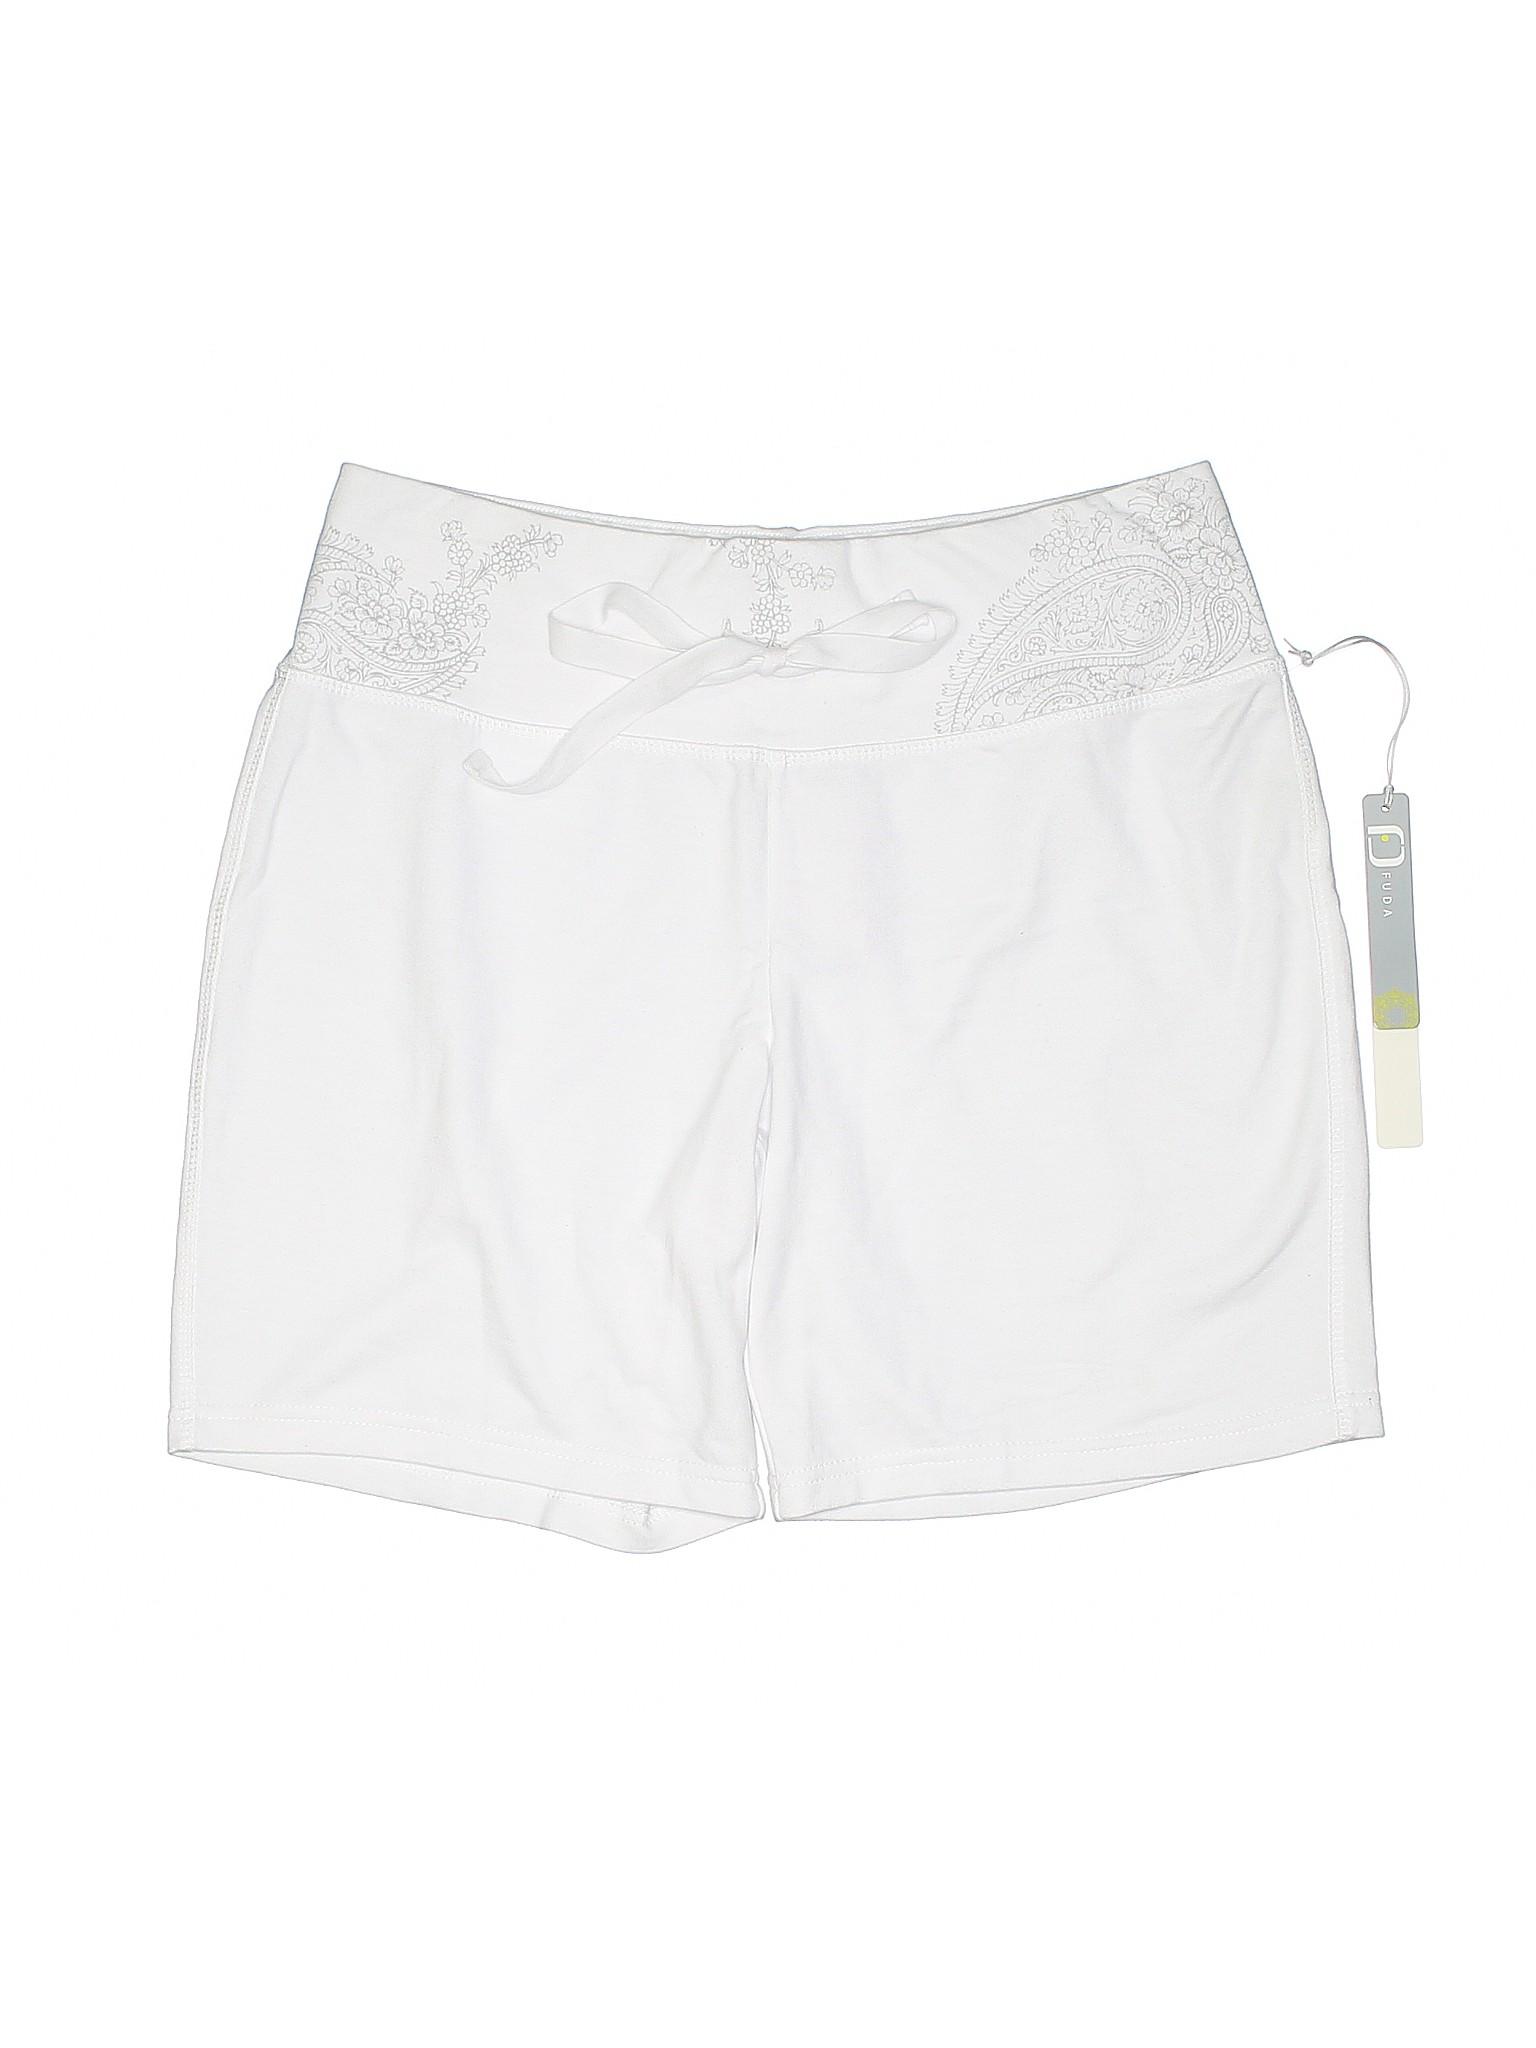 Fuda Boutique Fuda Boutique Fuda Boutique Shorts Shorts Shorts wRxq7pAP